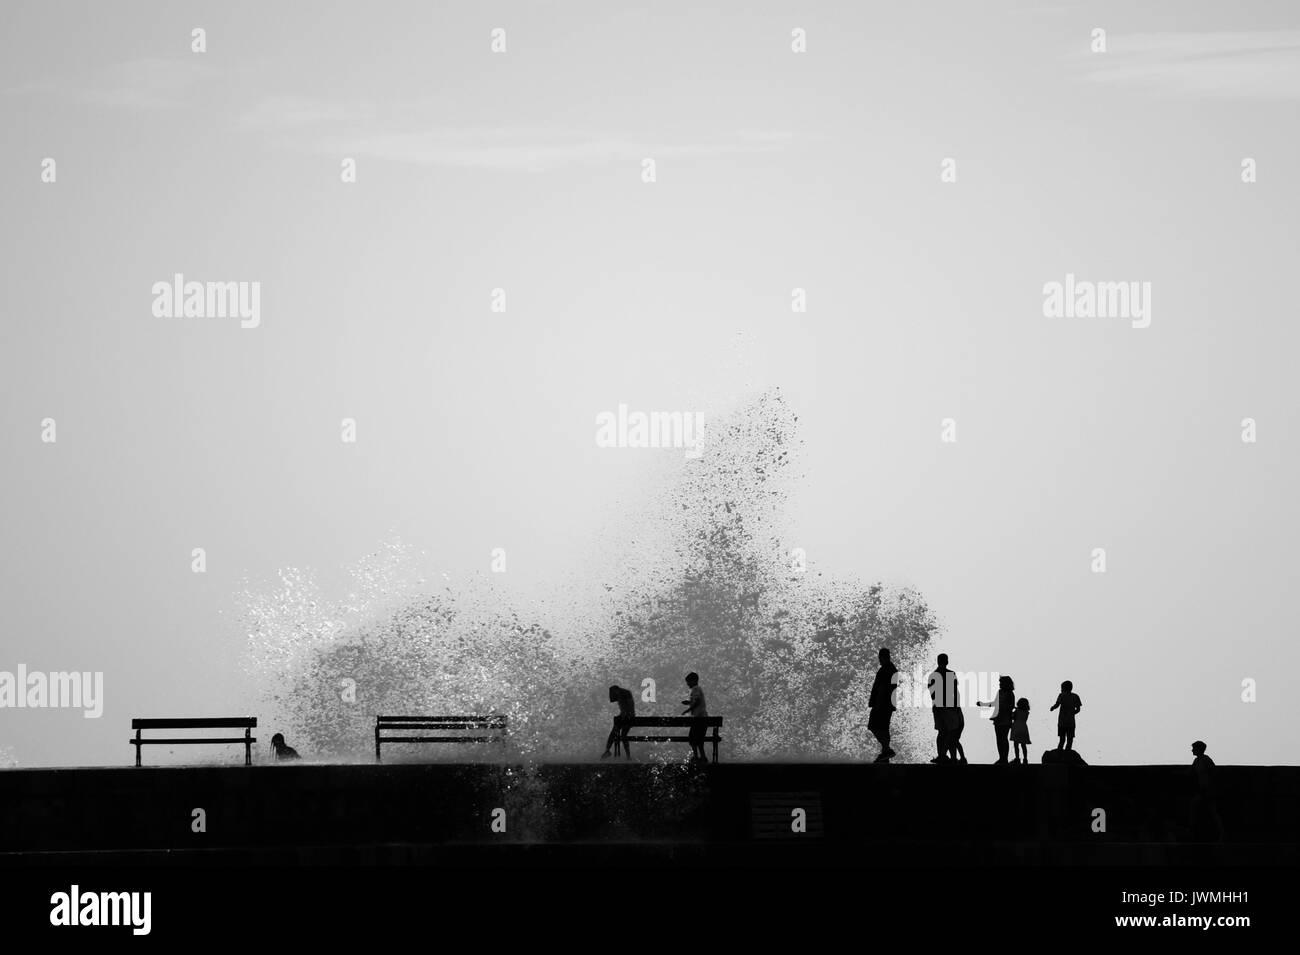 People silhouettes on the brakewater, big waves, water splashing, Porporela in Dubrovnik, Croatia Stock Photo